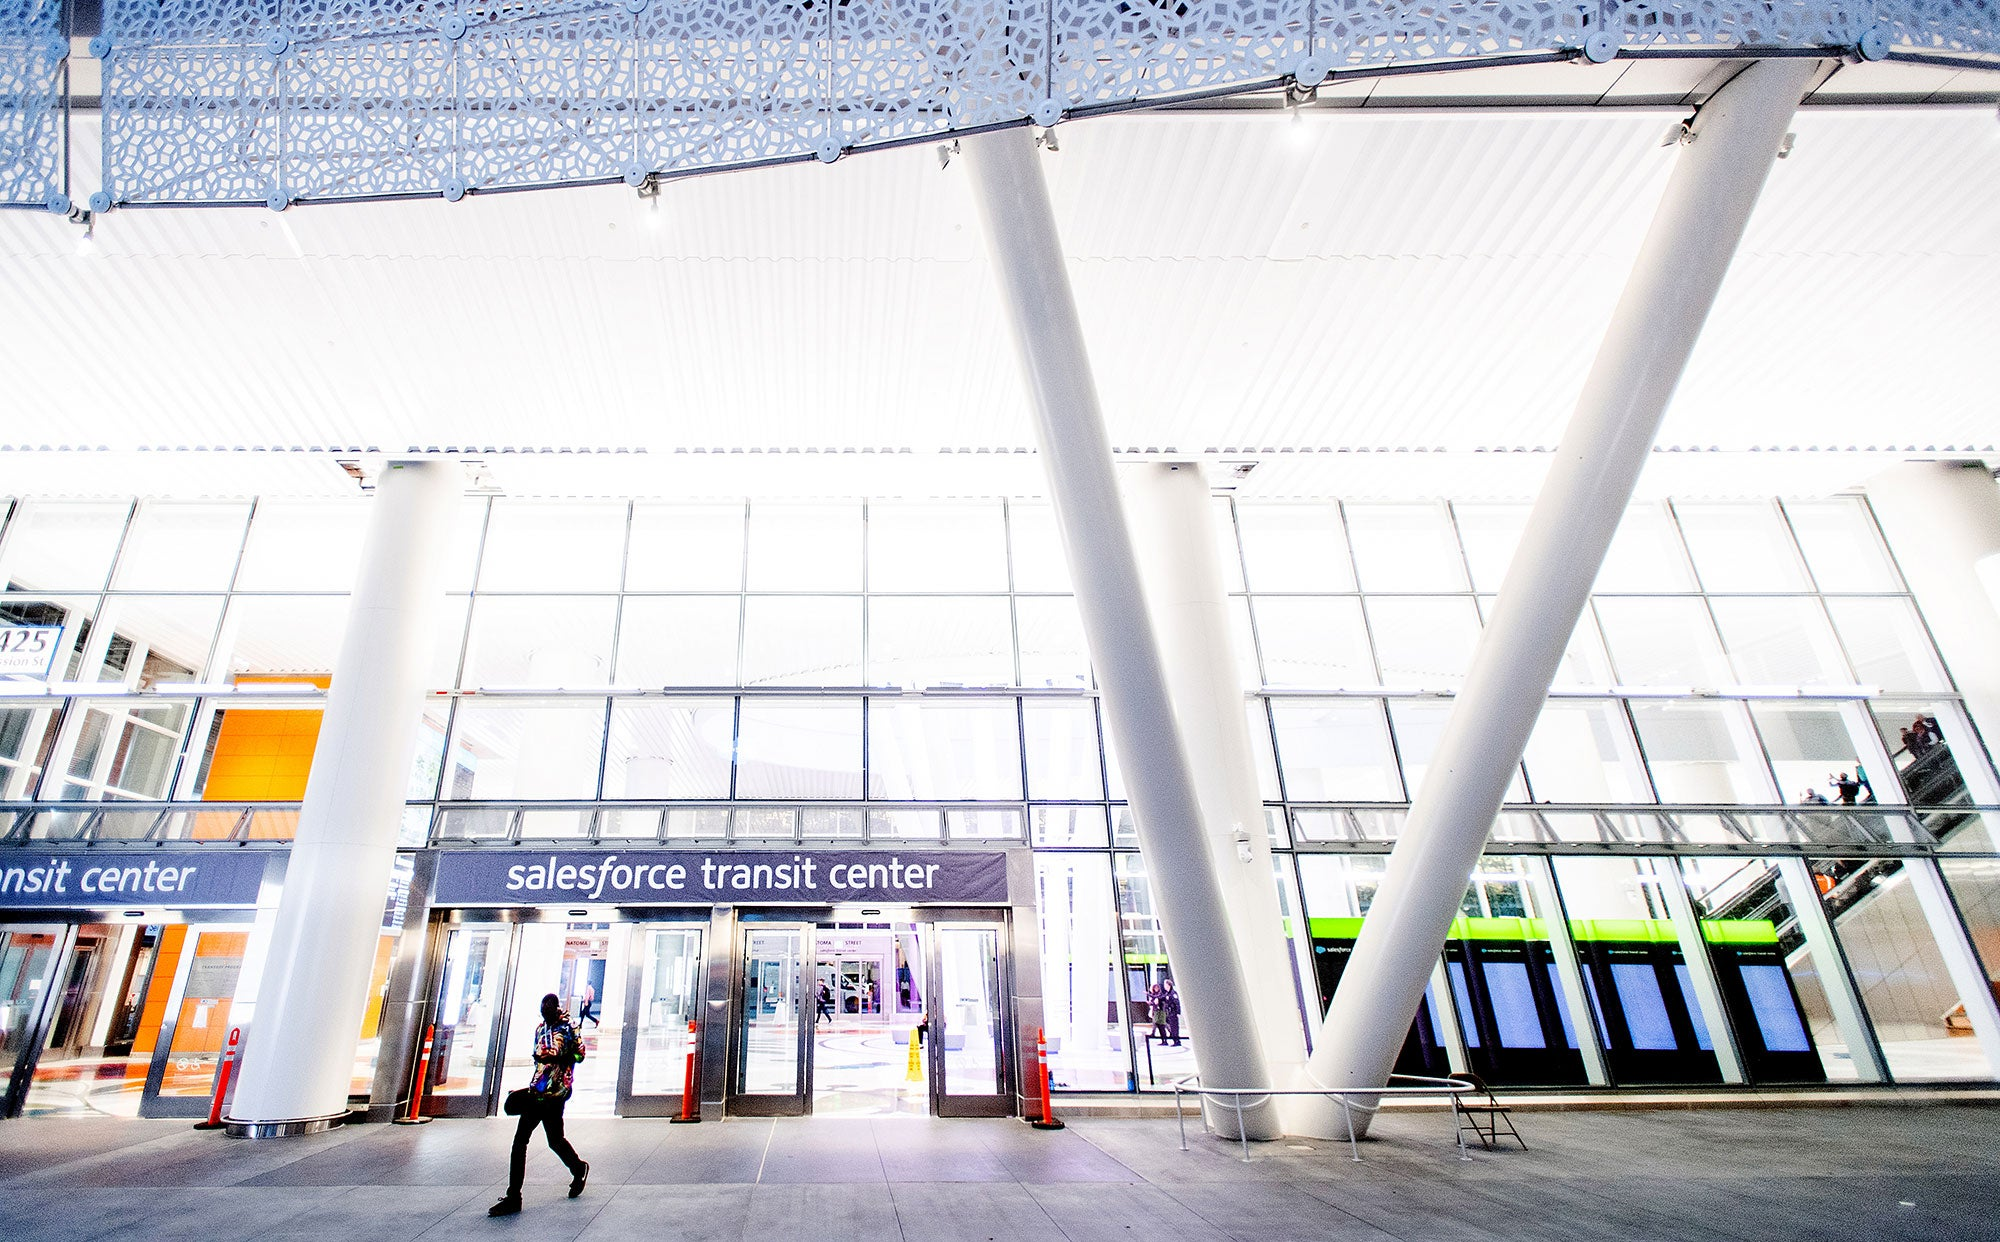 Salesforce Transit Center: Opening Day of AC Transit Service